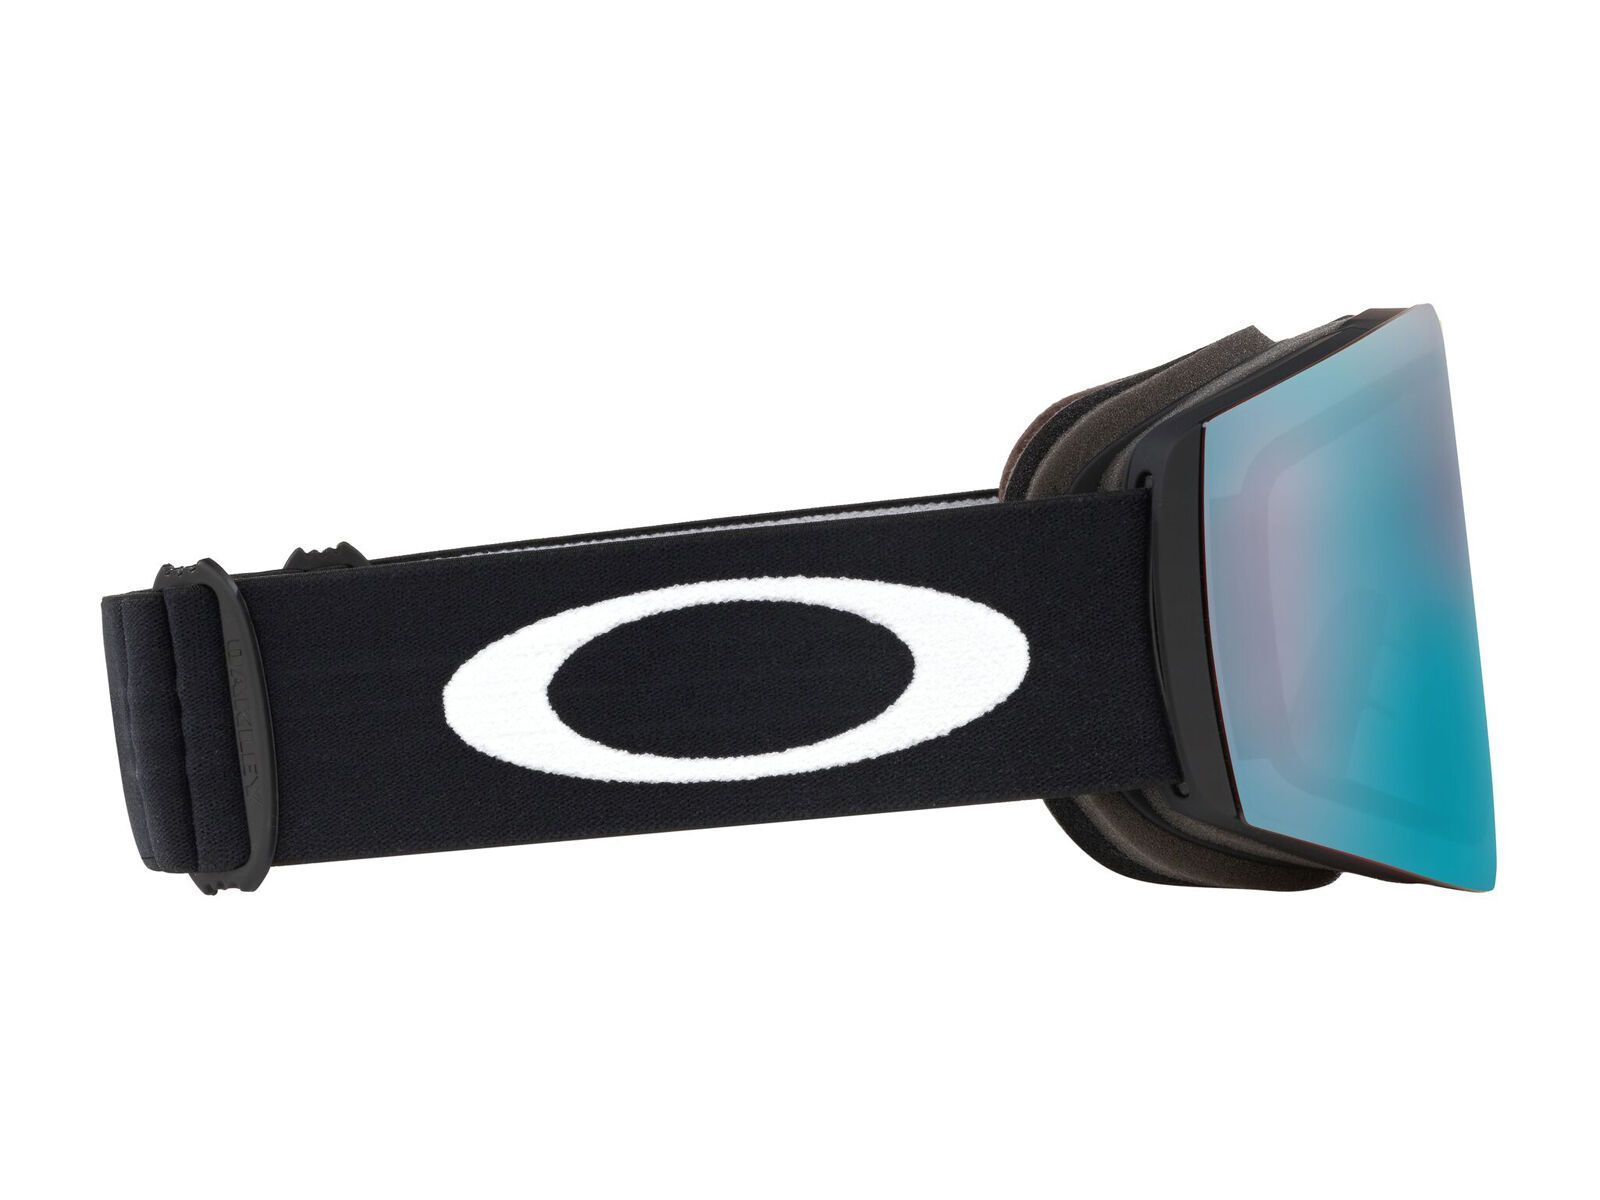 Oakley Fall Line XL - Prizm Sapphire Iridium, matte black/Lens: sapphire iridium | Bild 4